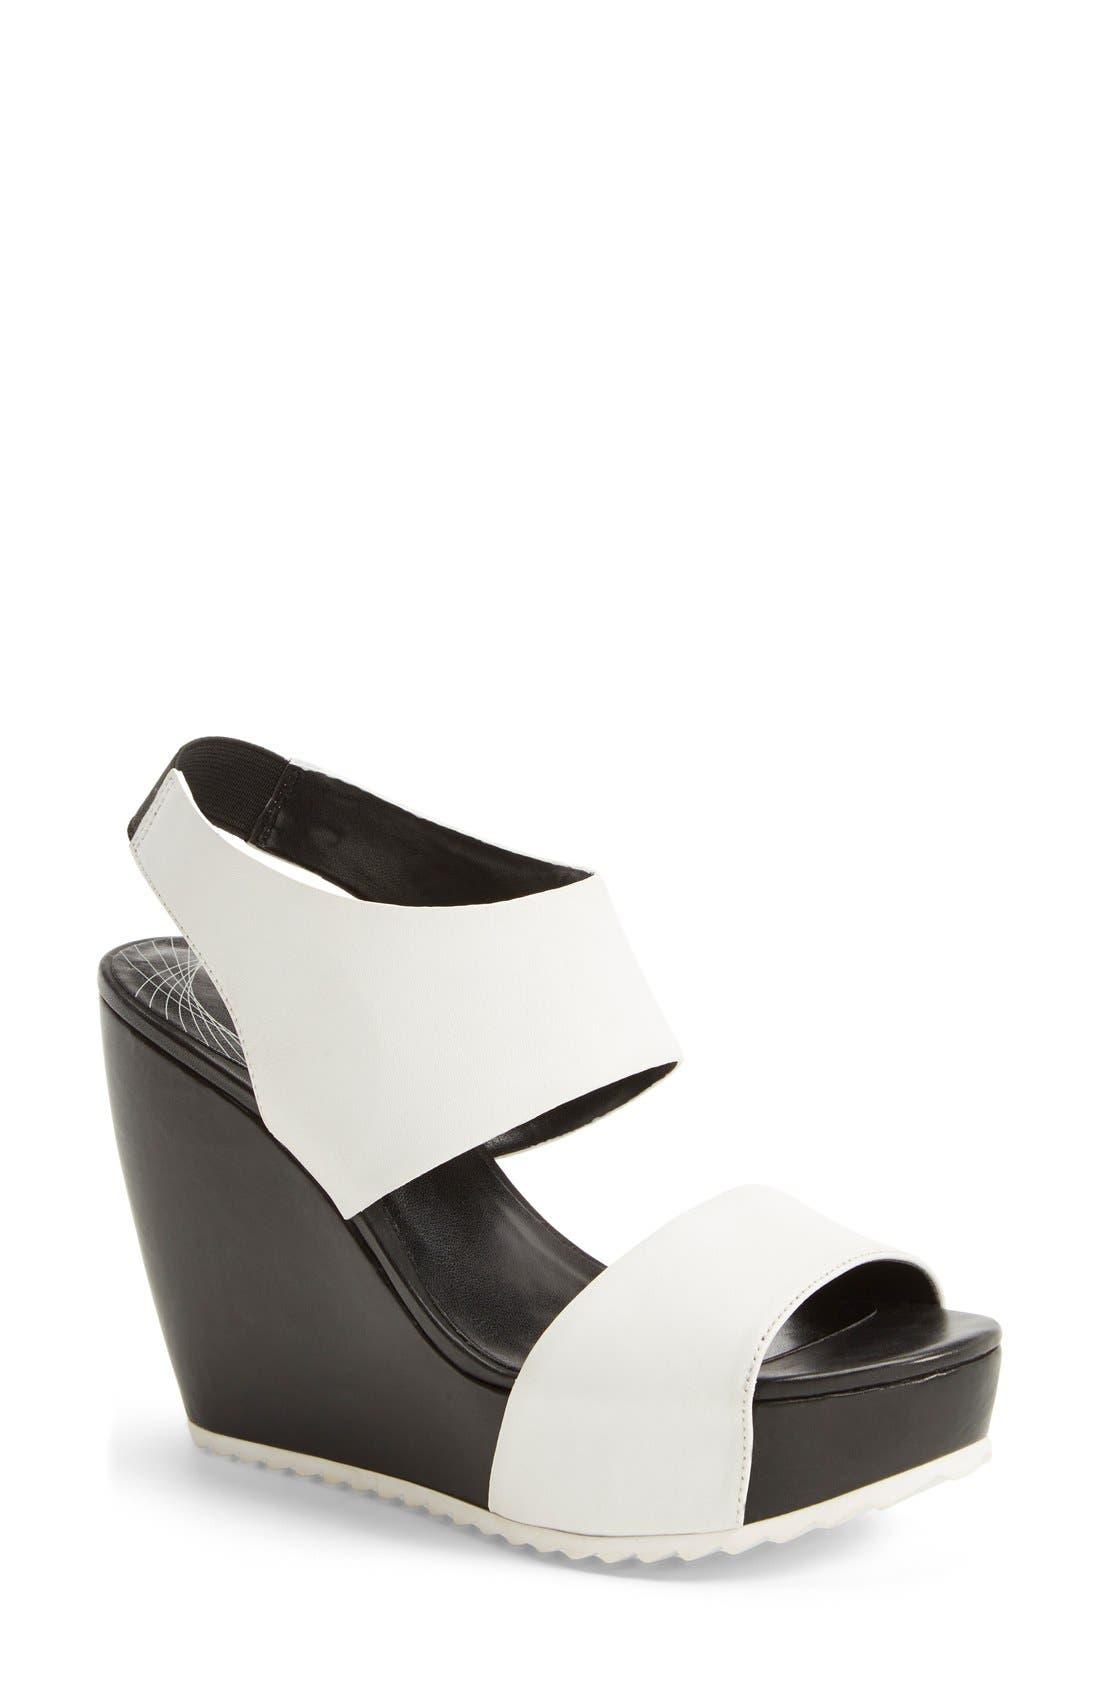 Alternate Image 1 Selected - Trouvé 'Morgan' Platform Wedge Leather Sandal (Women)